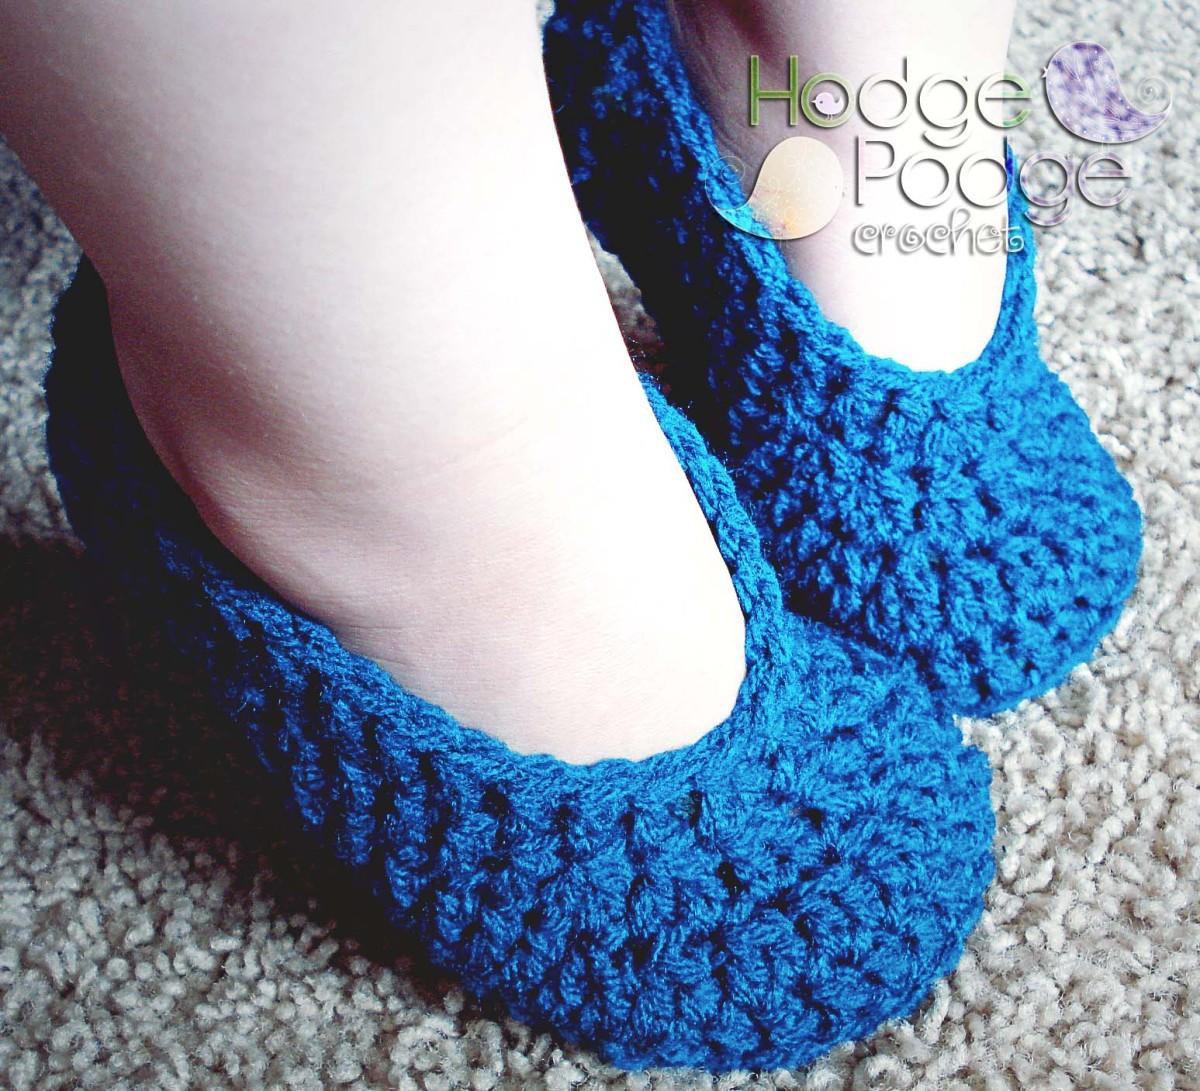 Simple Toddler Slippers Hodgepodge Crochet